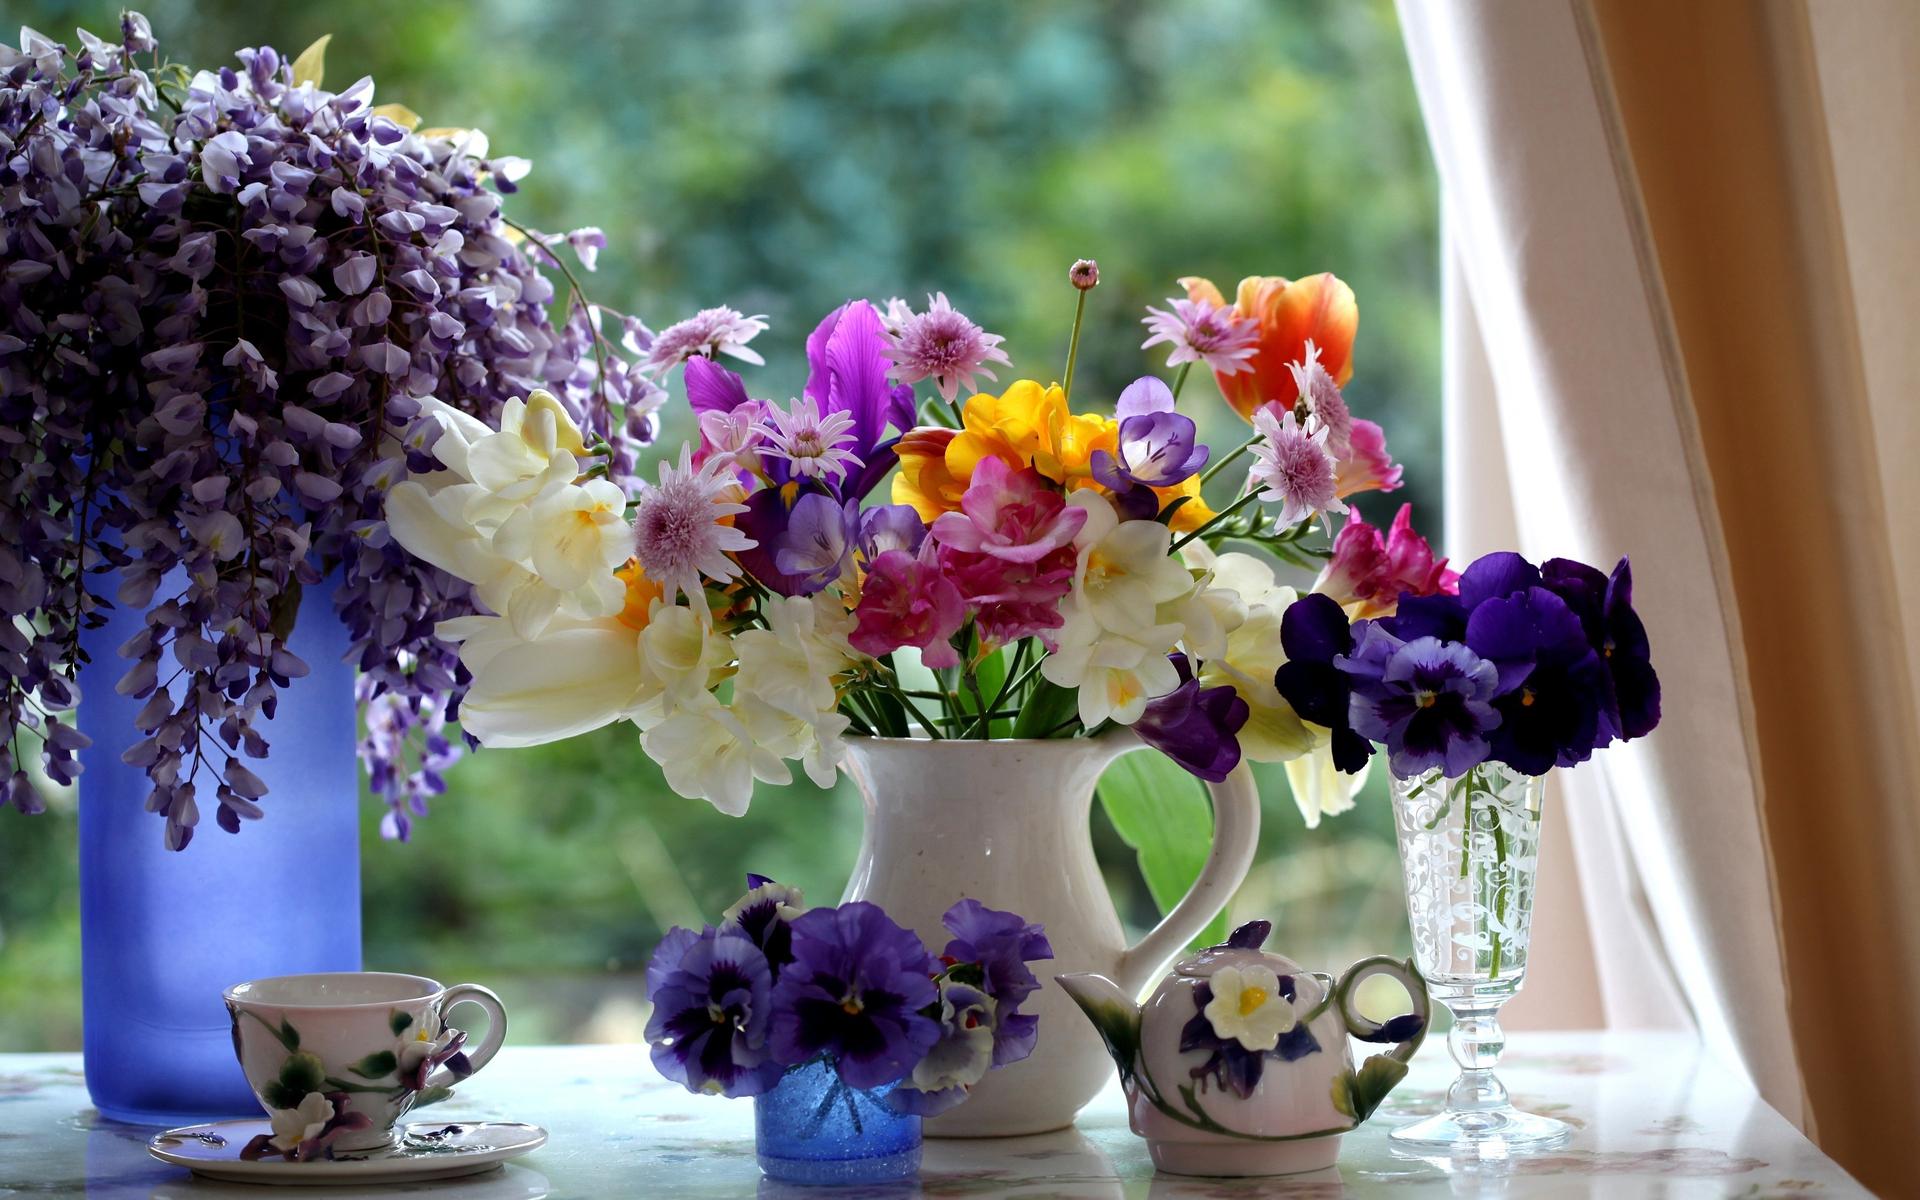 colors 1 flower 1 flowers 1 petals 1 photography 1 still life 1 1920x1200